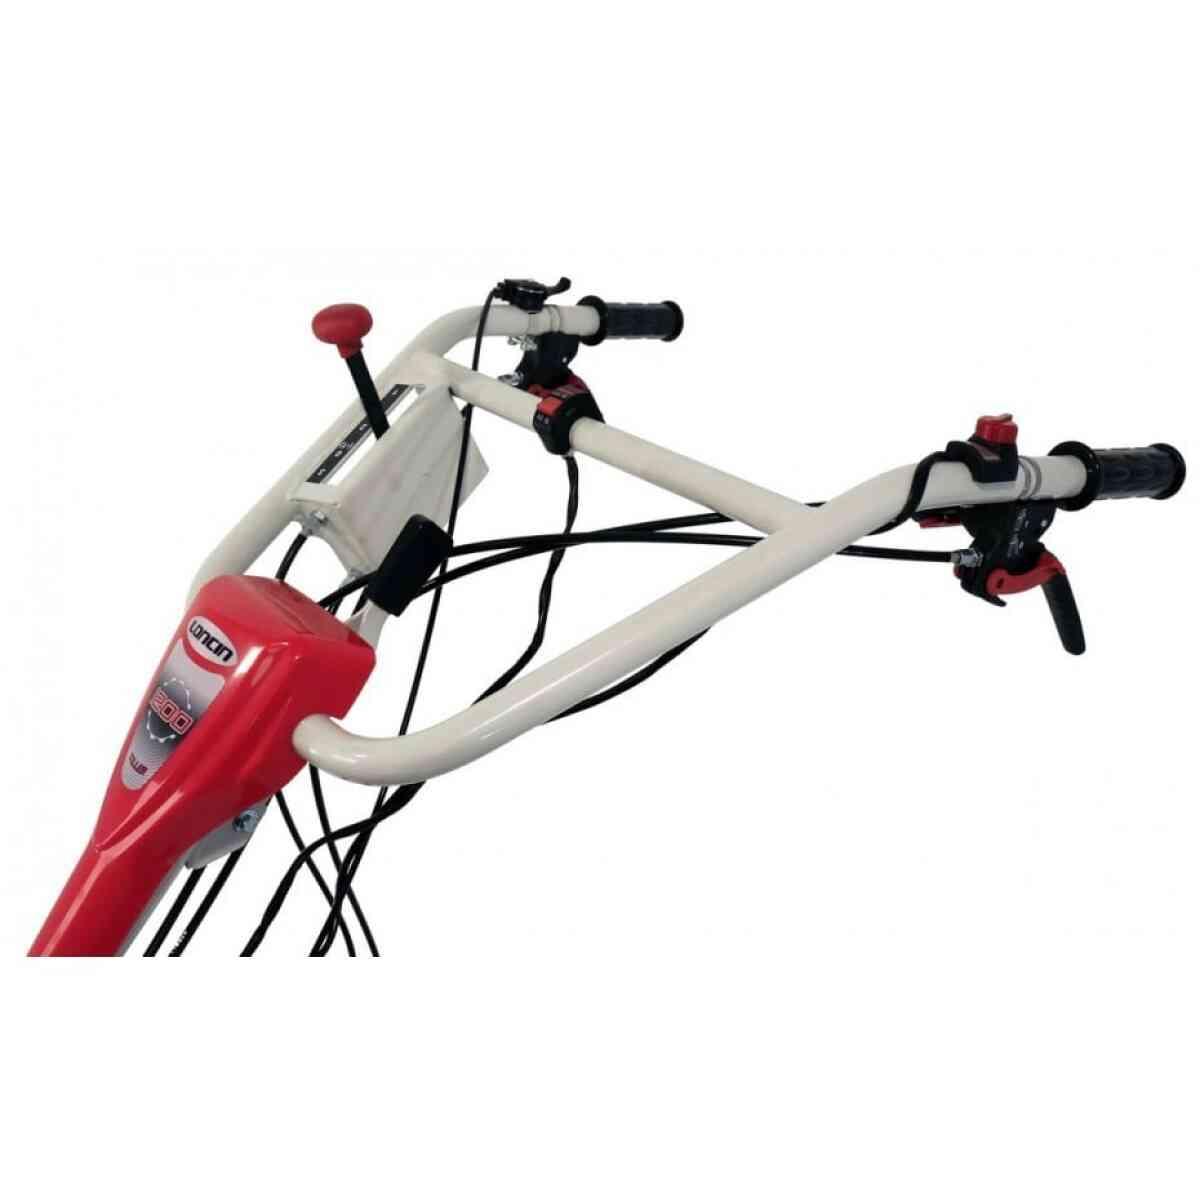 motocultor loncin lc1200 3plus1 o mac.ro 6 1 17